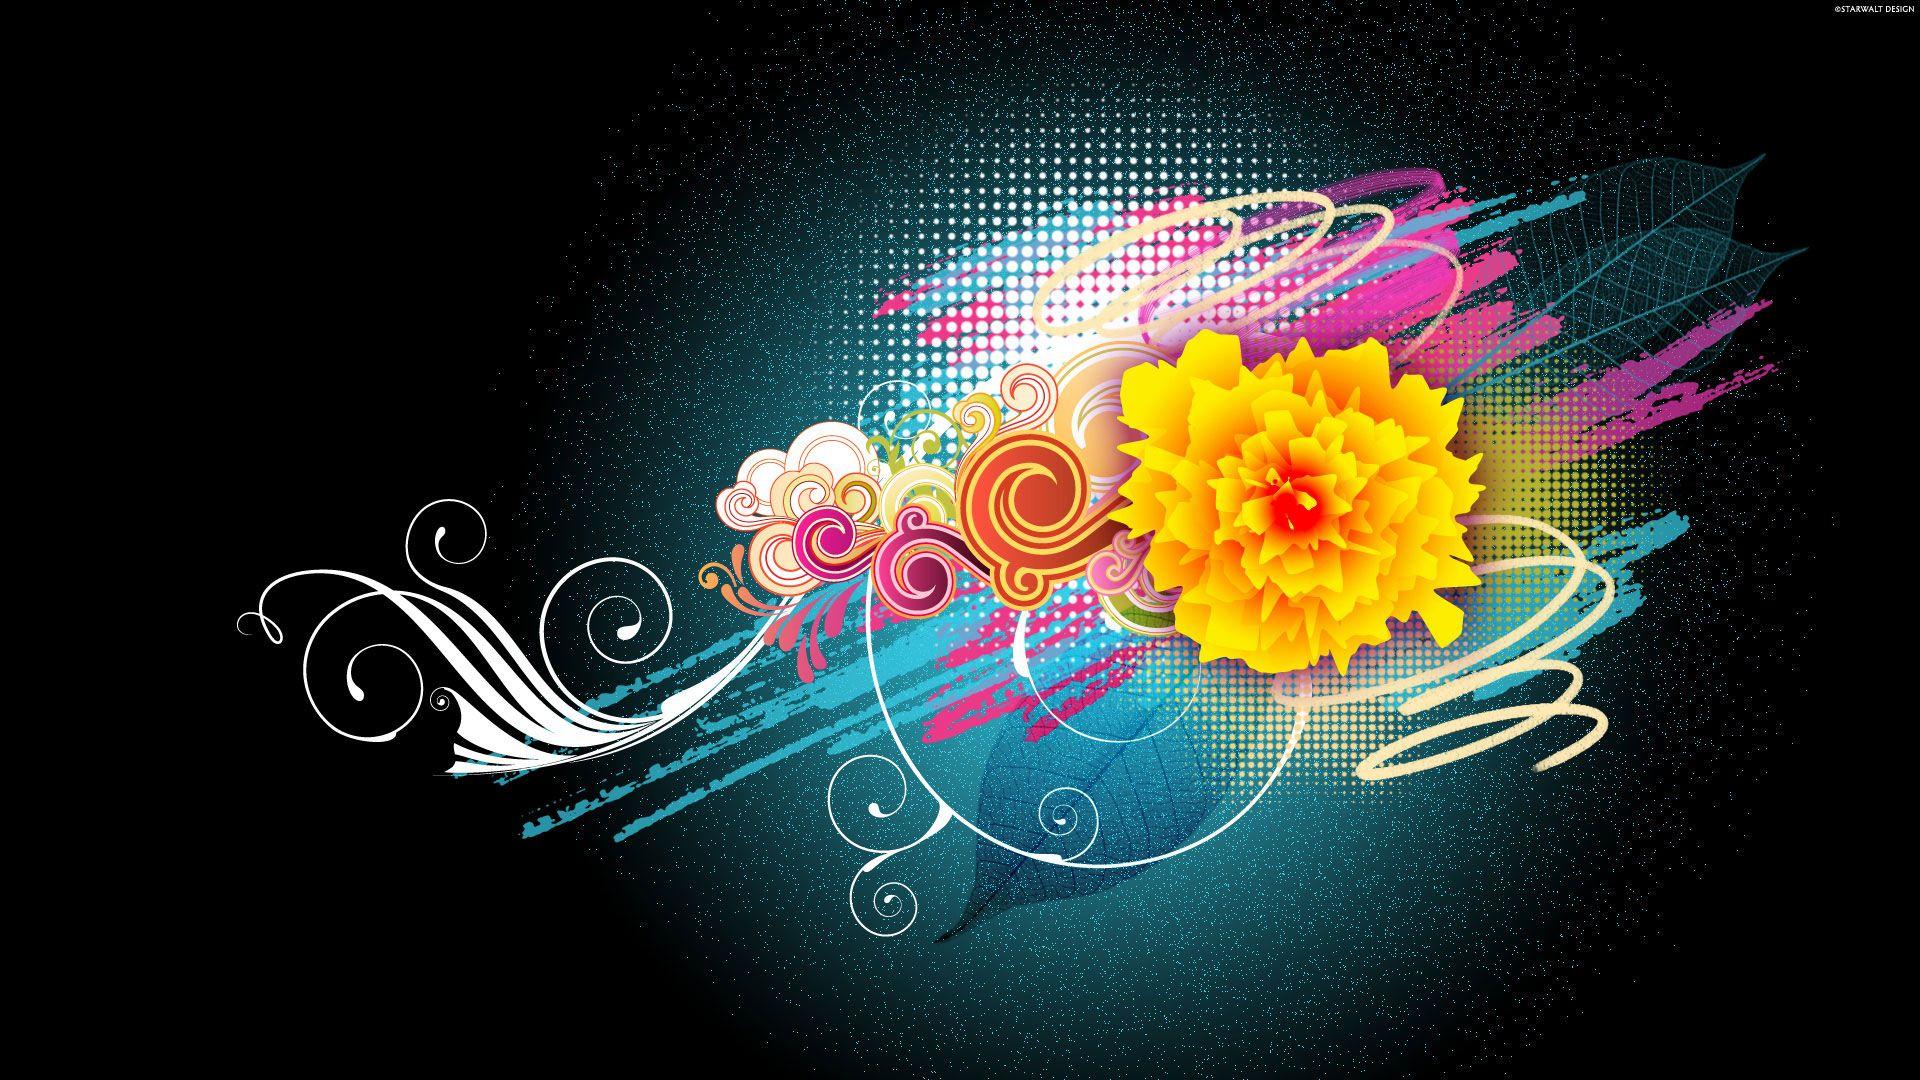 Hd wallpaper vector - Flower Vector Designs 1080p